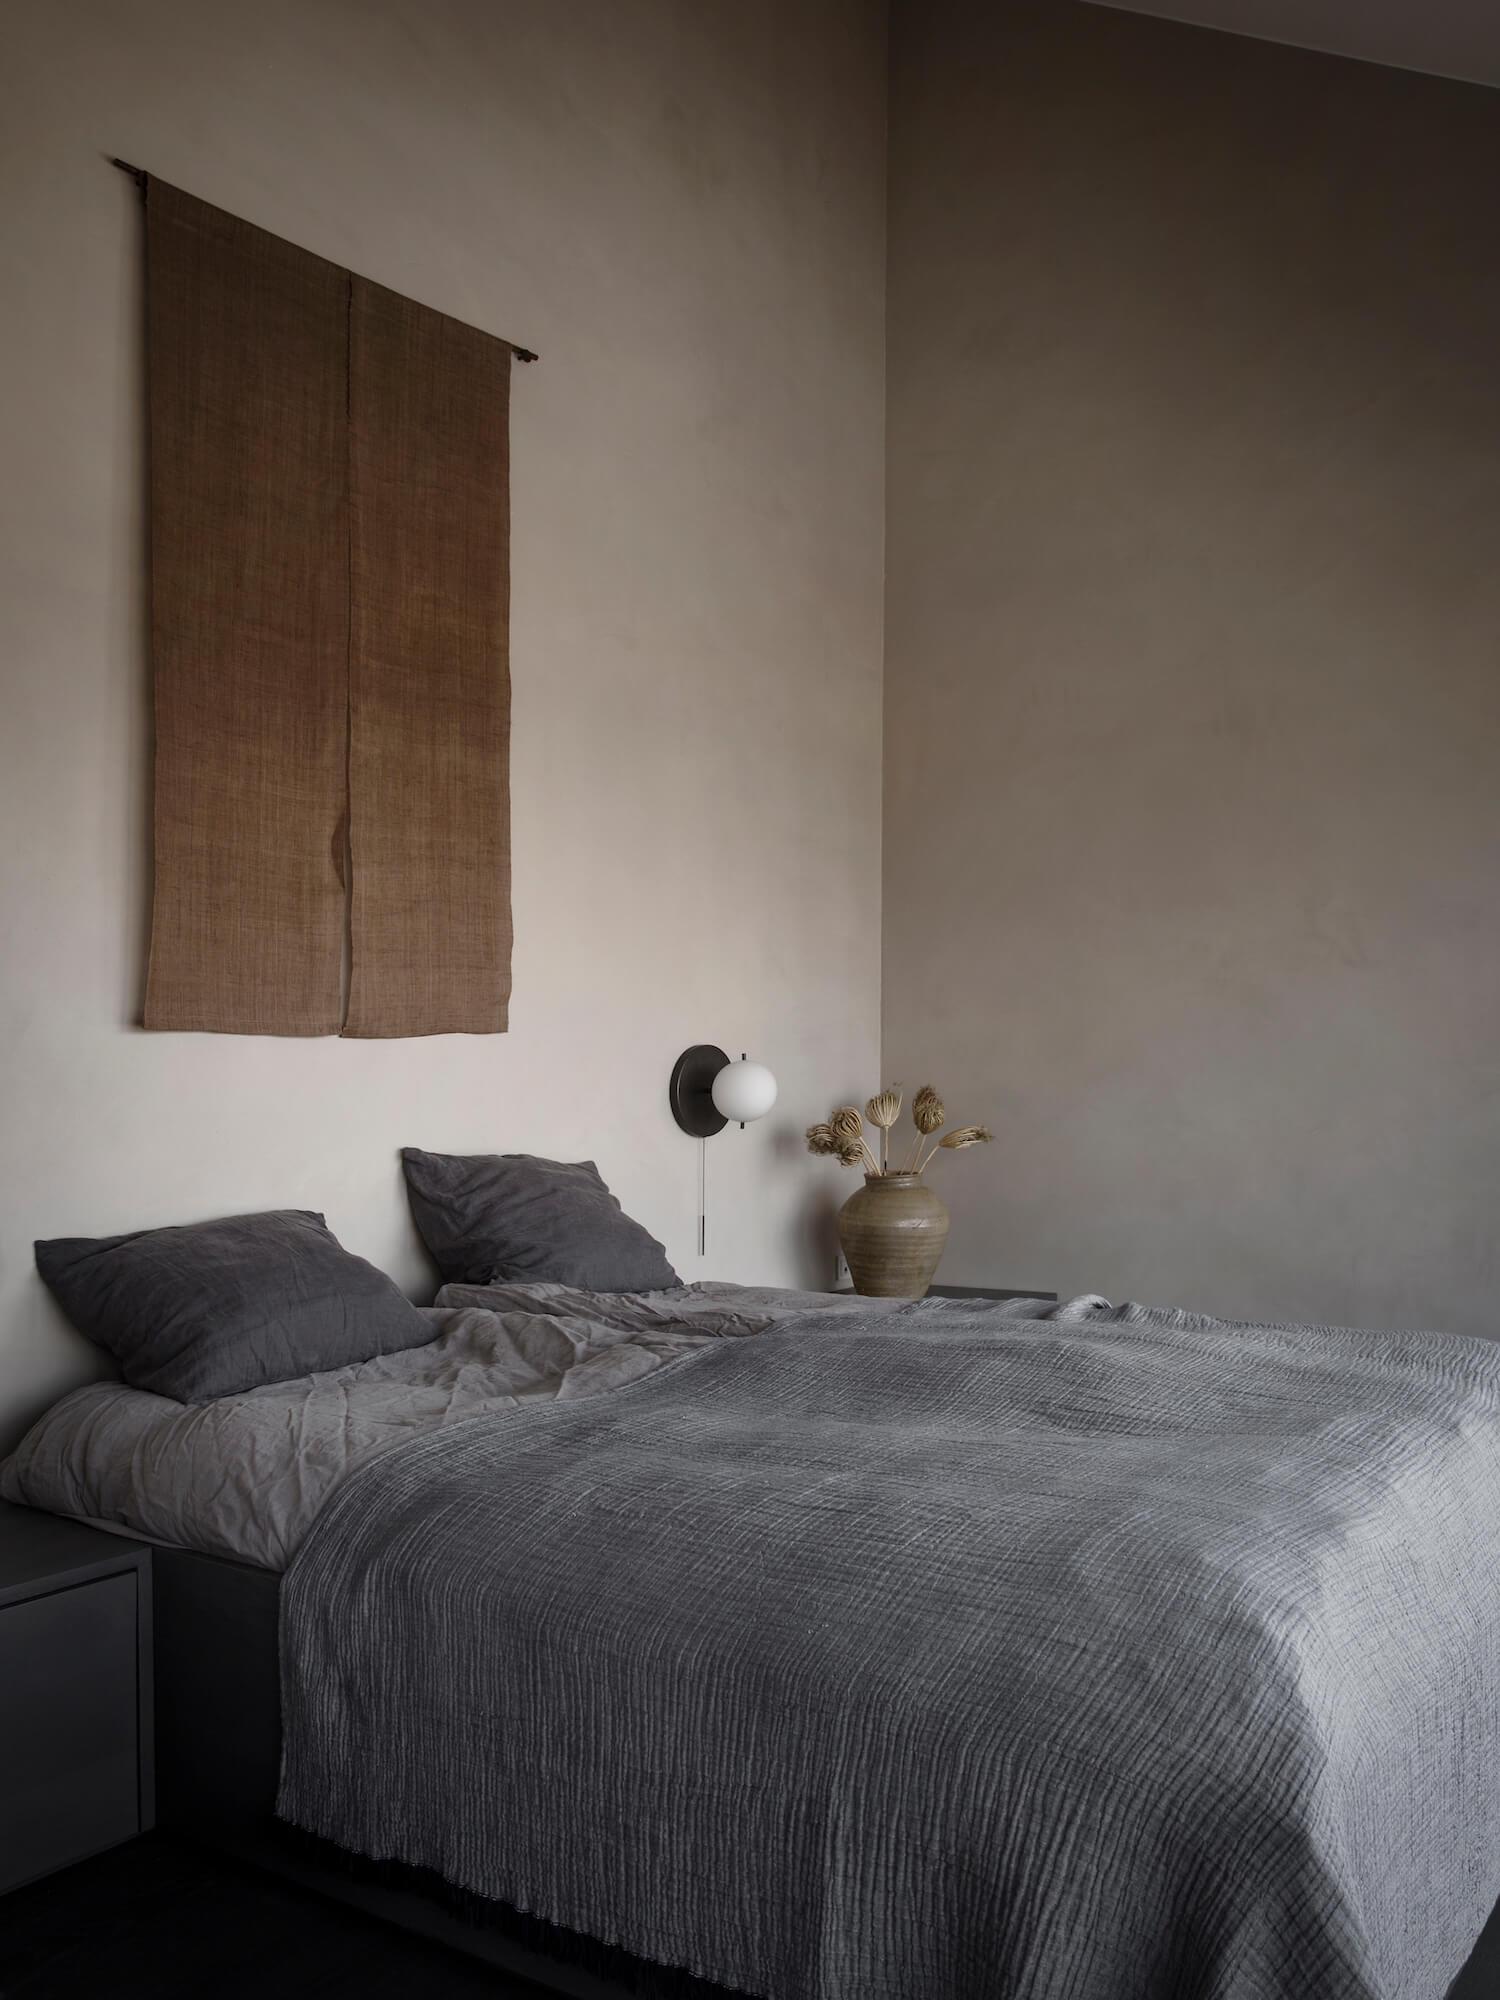 Wabi Sabi: How to create a perfectly imperfect home - Vinterior